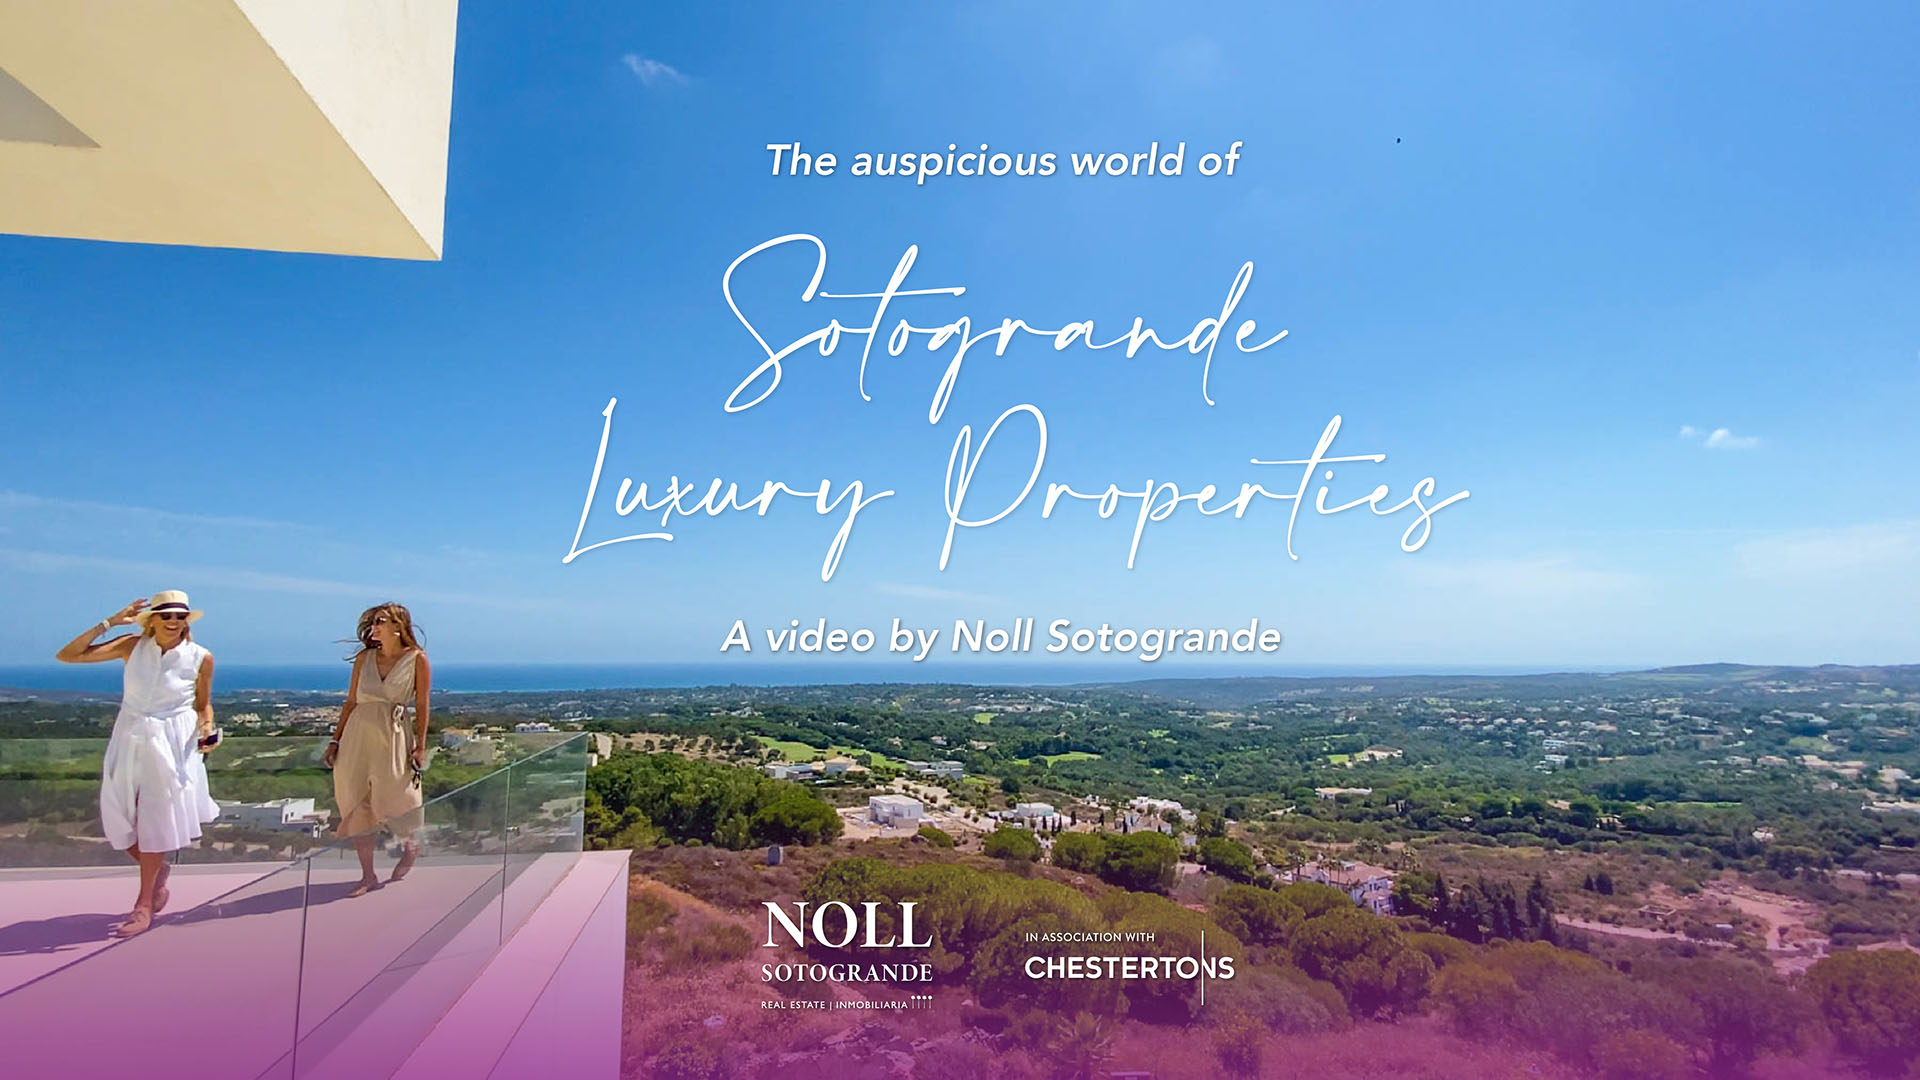 The auspicious world of Sotogrande luxury properties